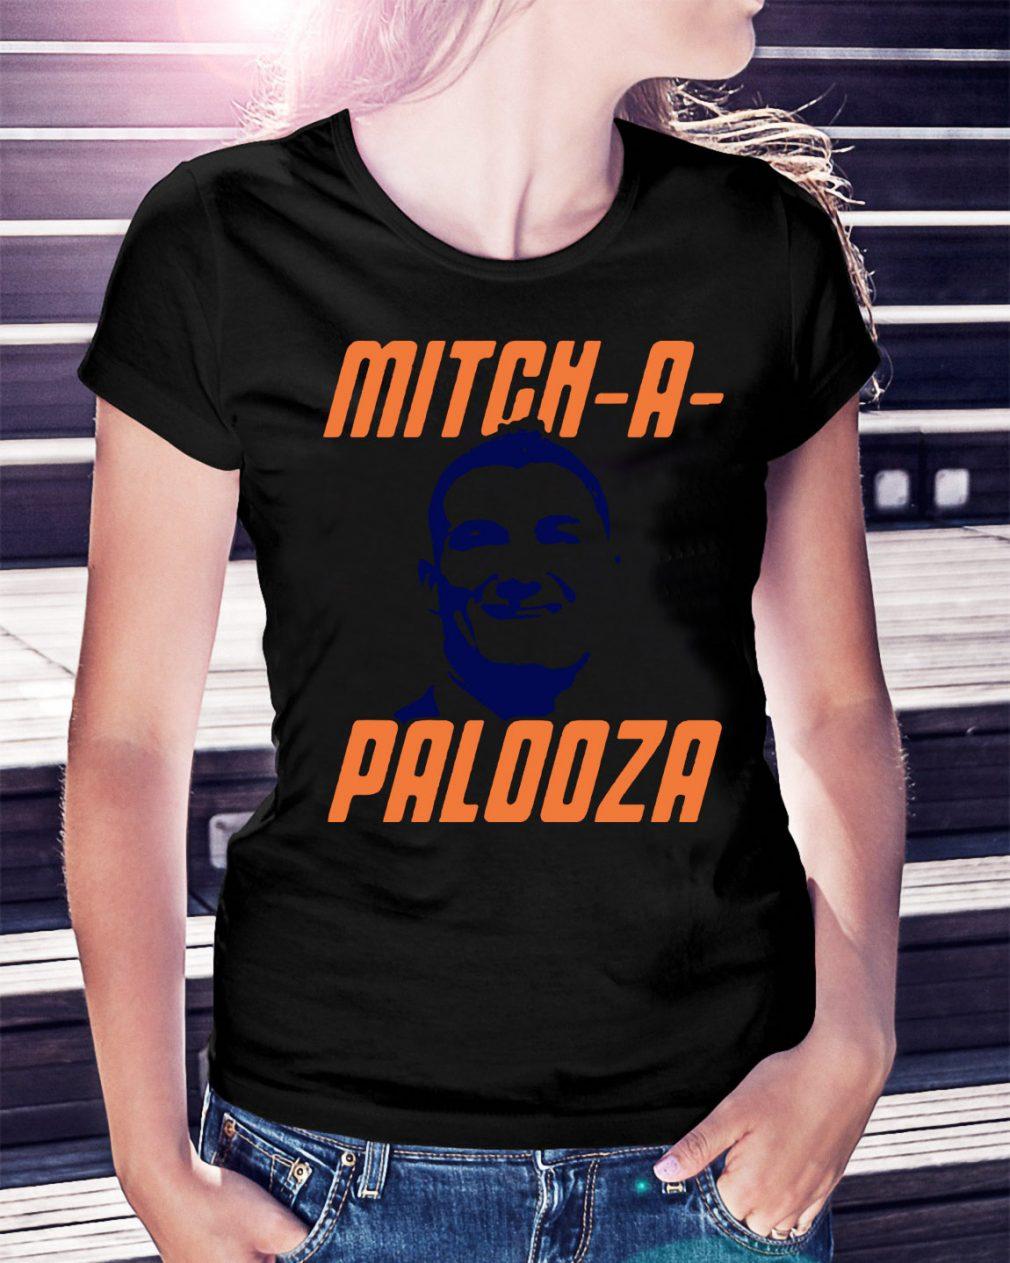 Mitch-A-Palooza Ladies Tee